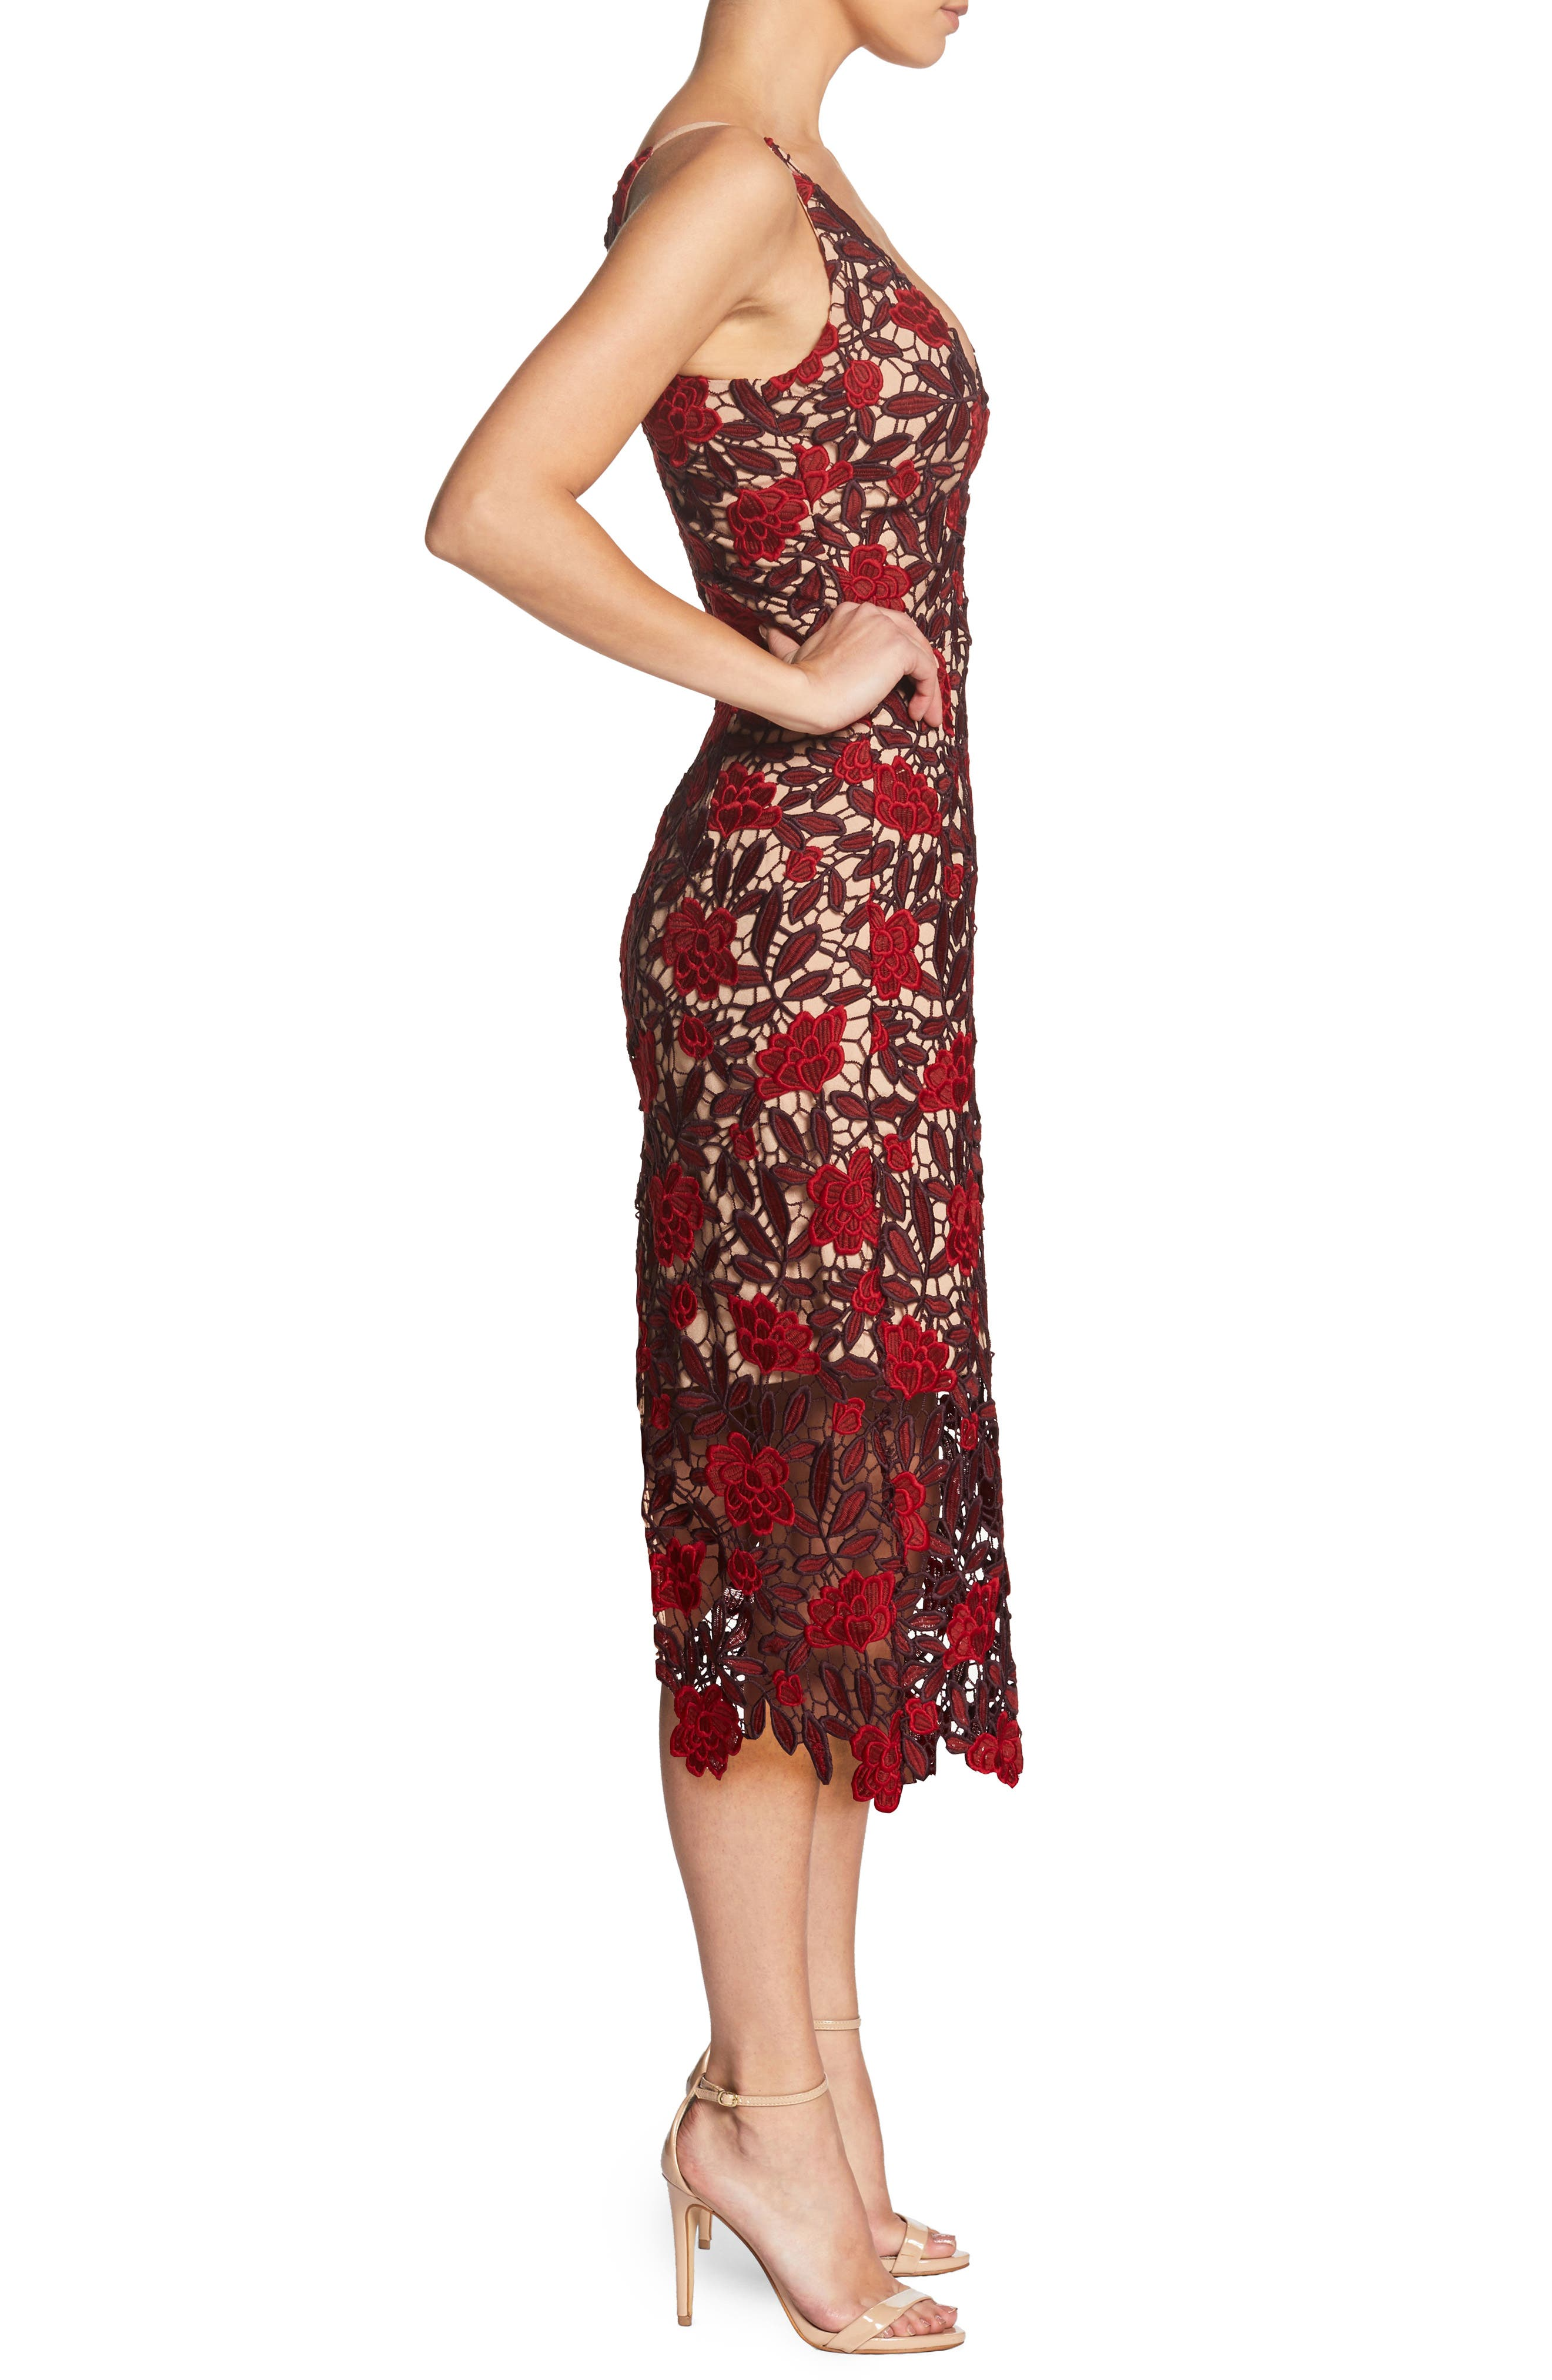 Aurora Embroidered Sheath Dress,                             Alternate thumbnail 3, color,                             GARNET/ NUDE